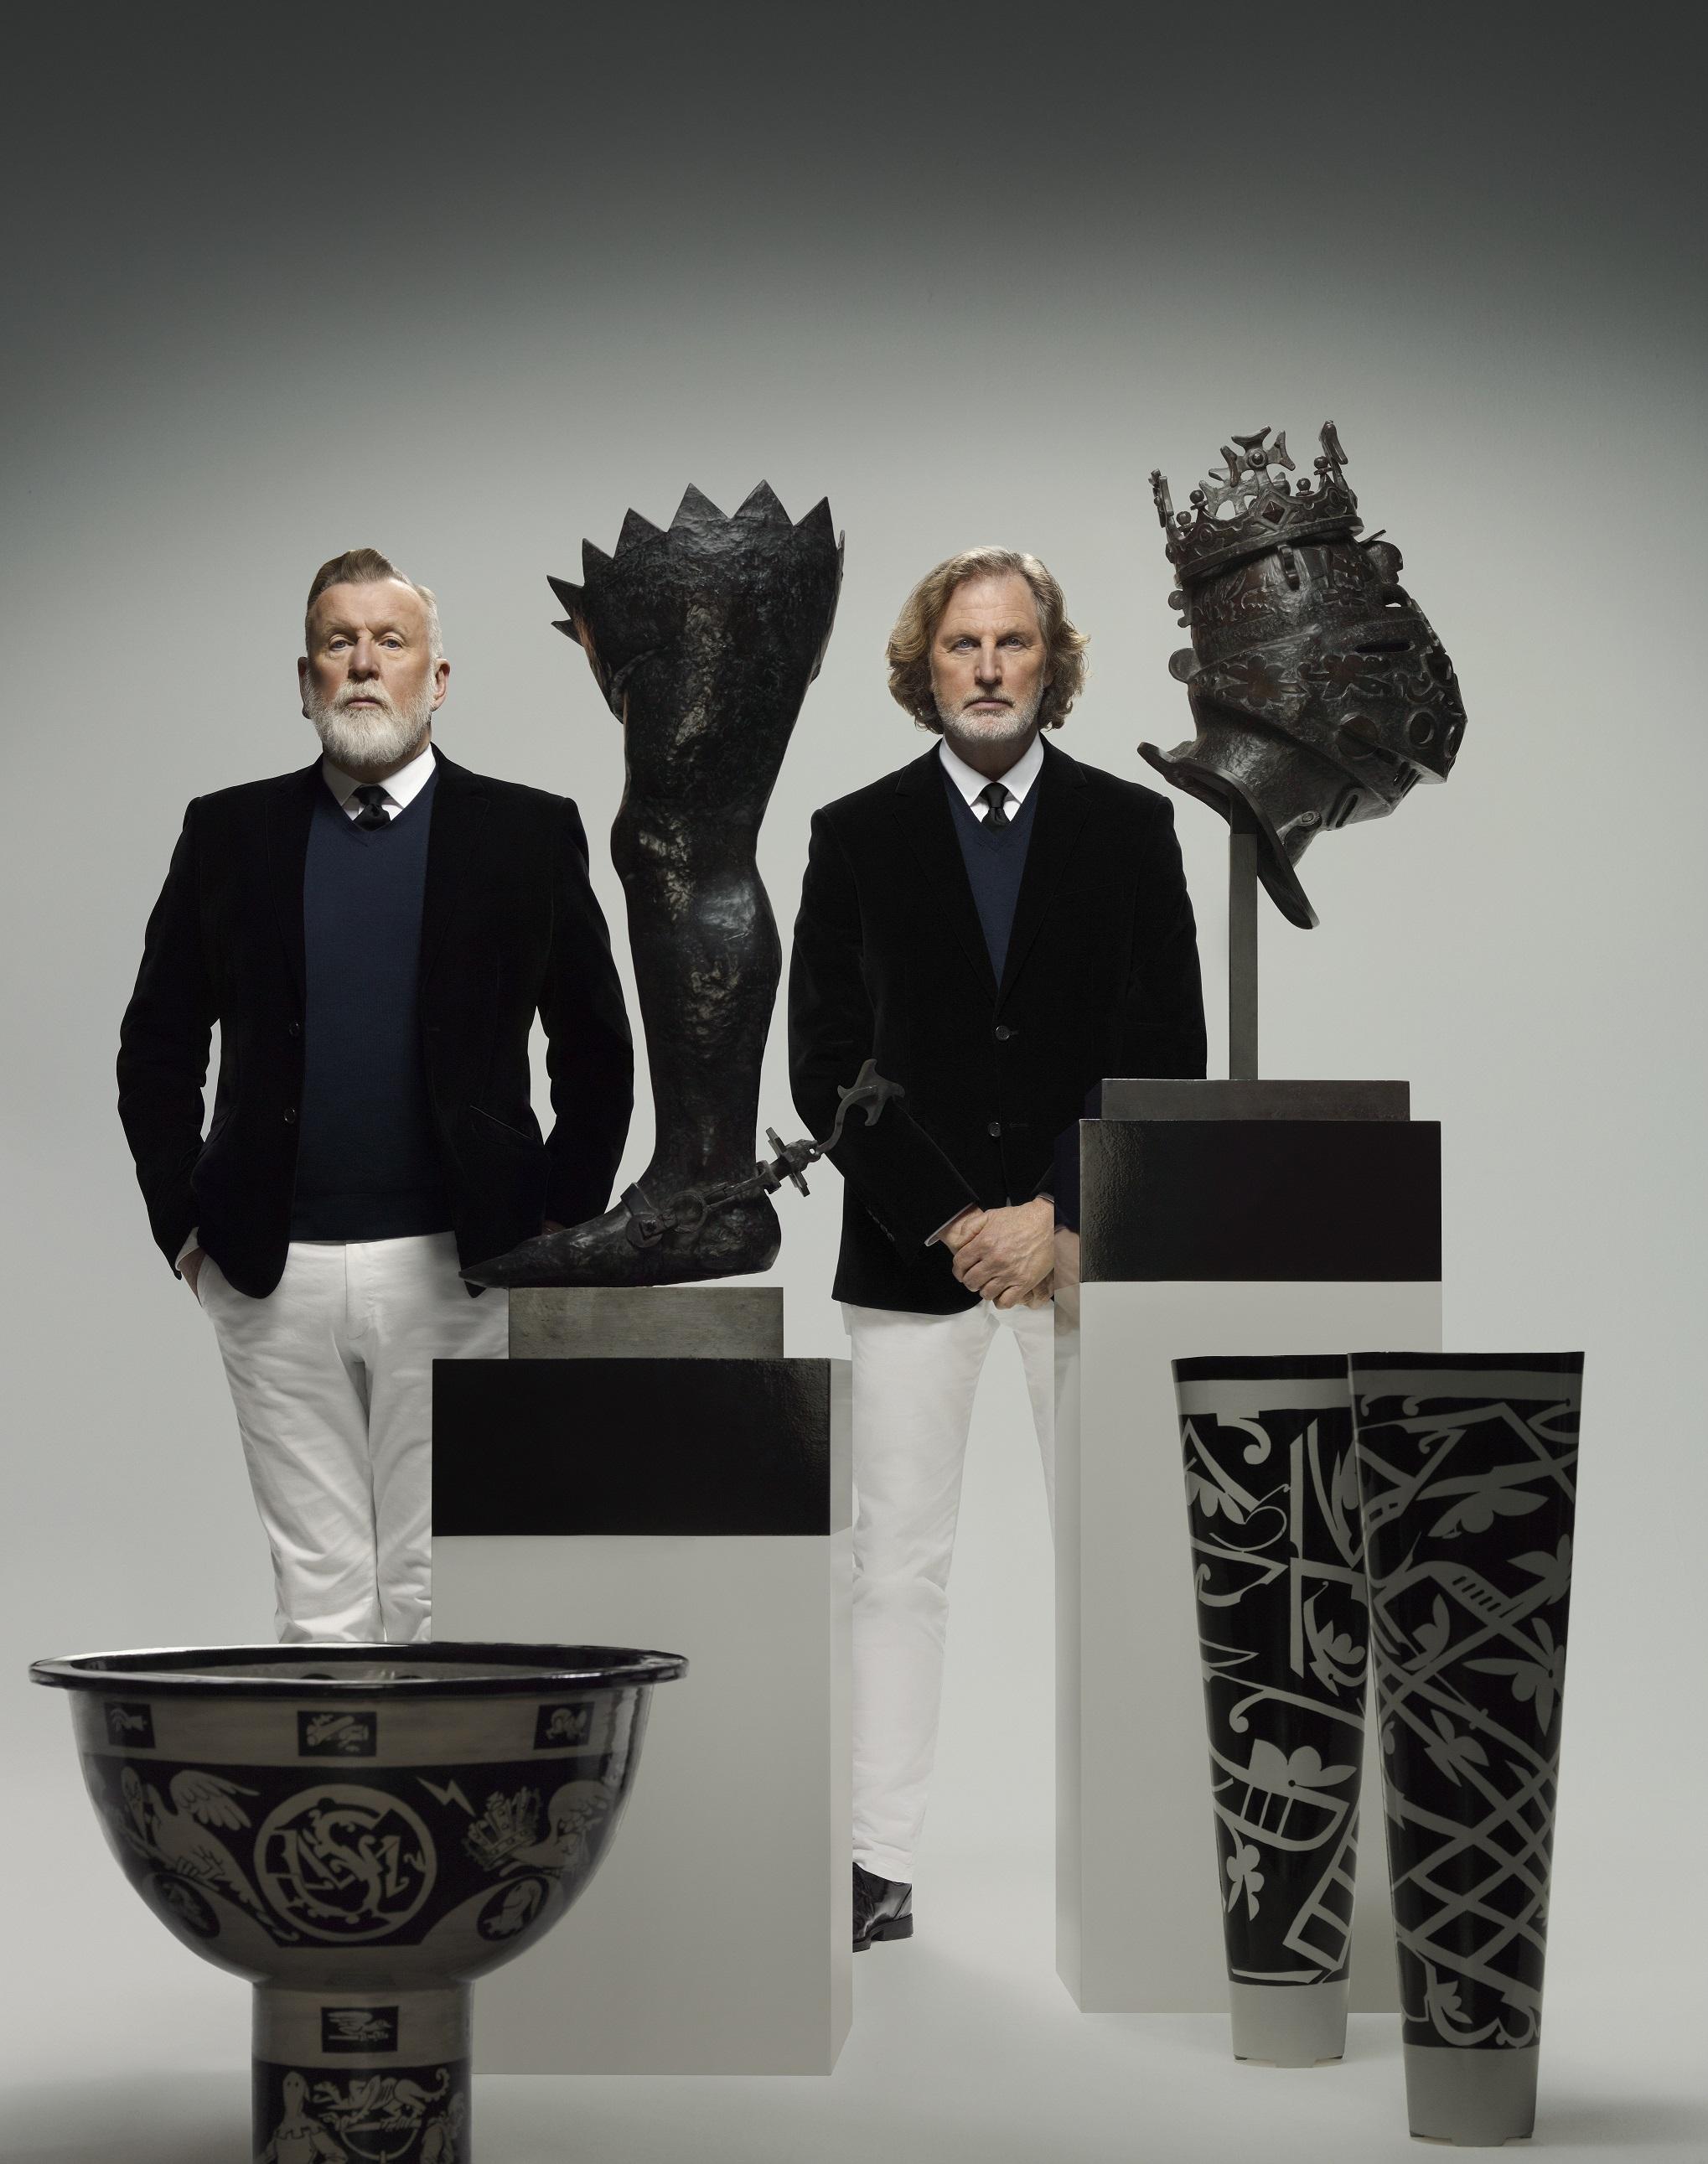 RAVAGE, Clemens Rameckers & Arnold van Geuns, 2016 Foto: ©Erwin Olaf